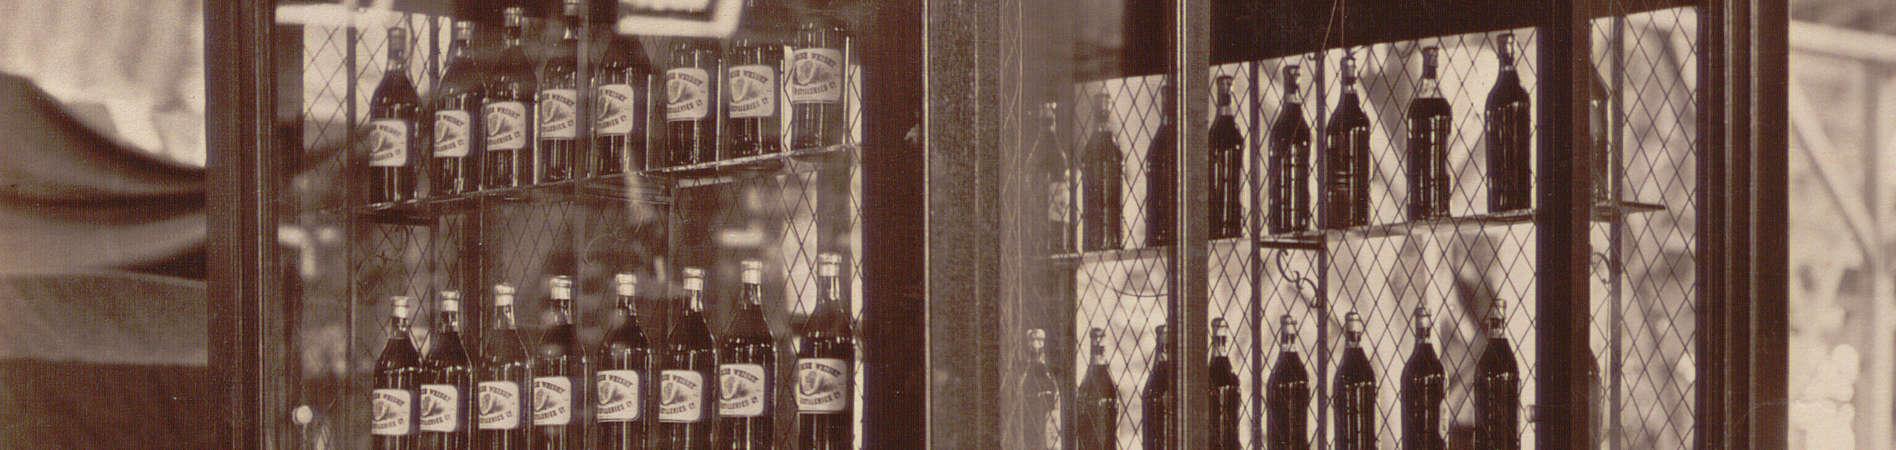 Whisky in bottles and barrels